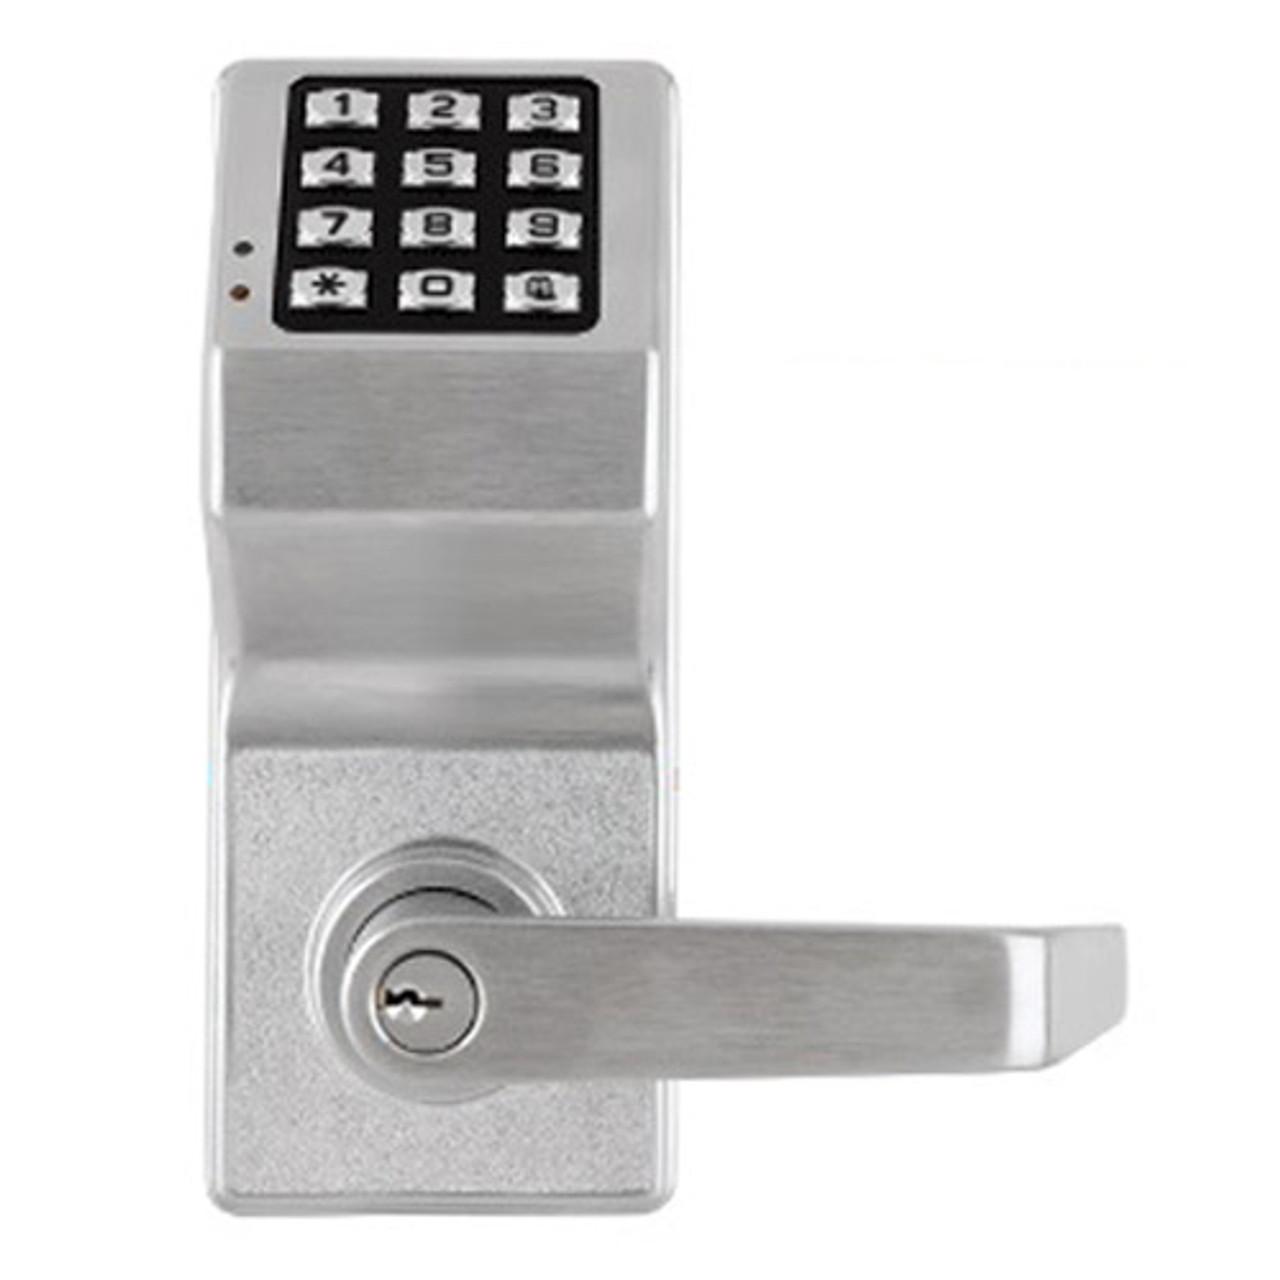 DL2800-US26D Alarm Lock Trilogy Electronic Digital Lock in Satin Chrome Finish